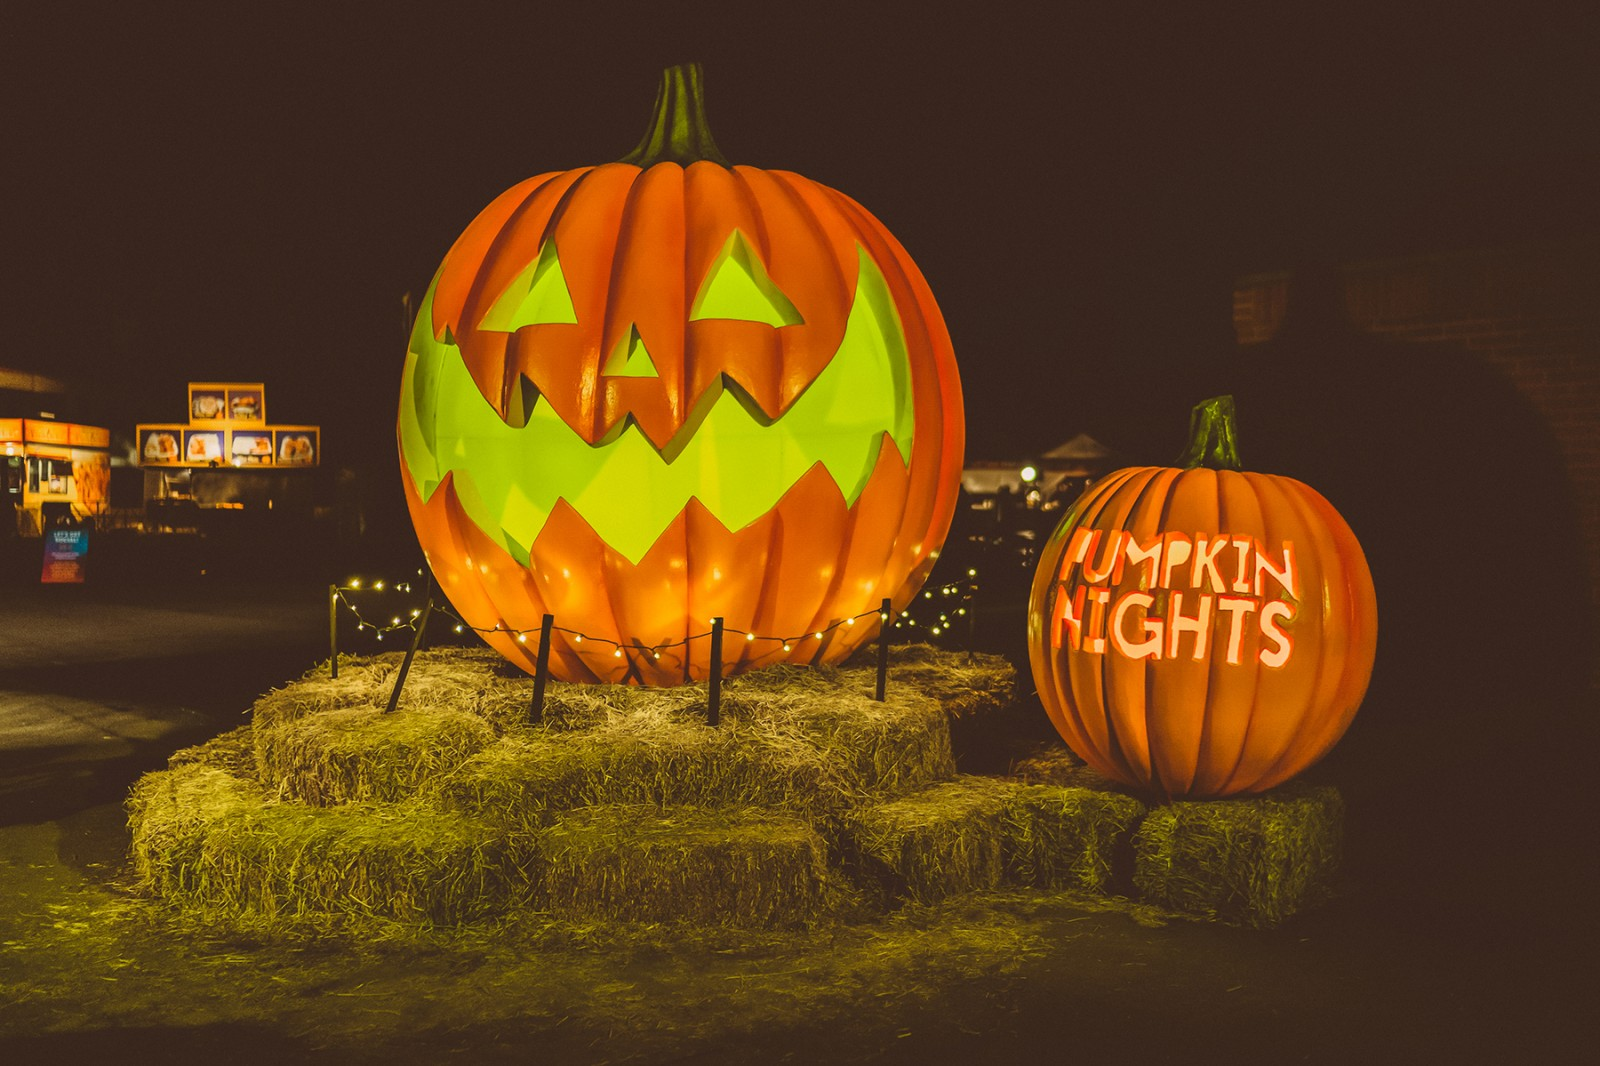 Pumpkin Nights Pomona